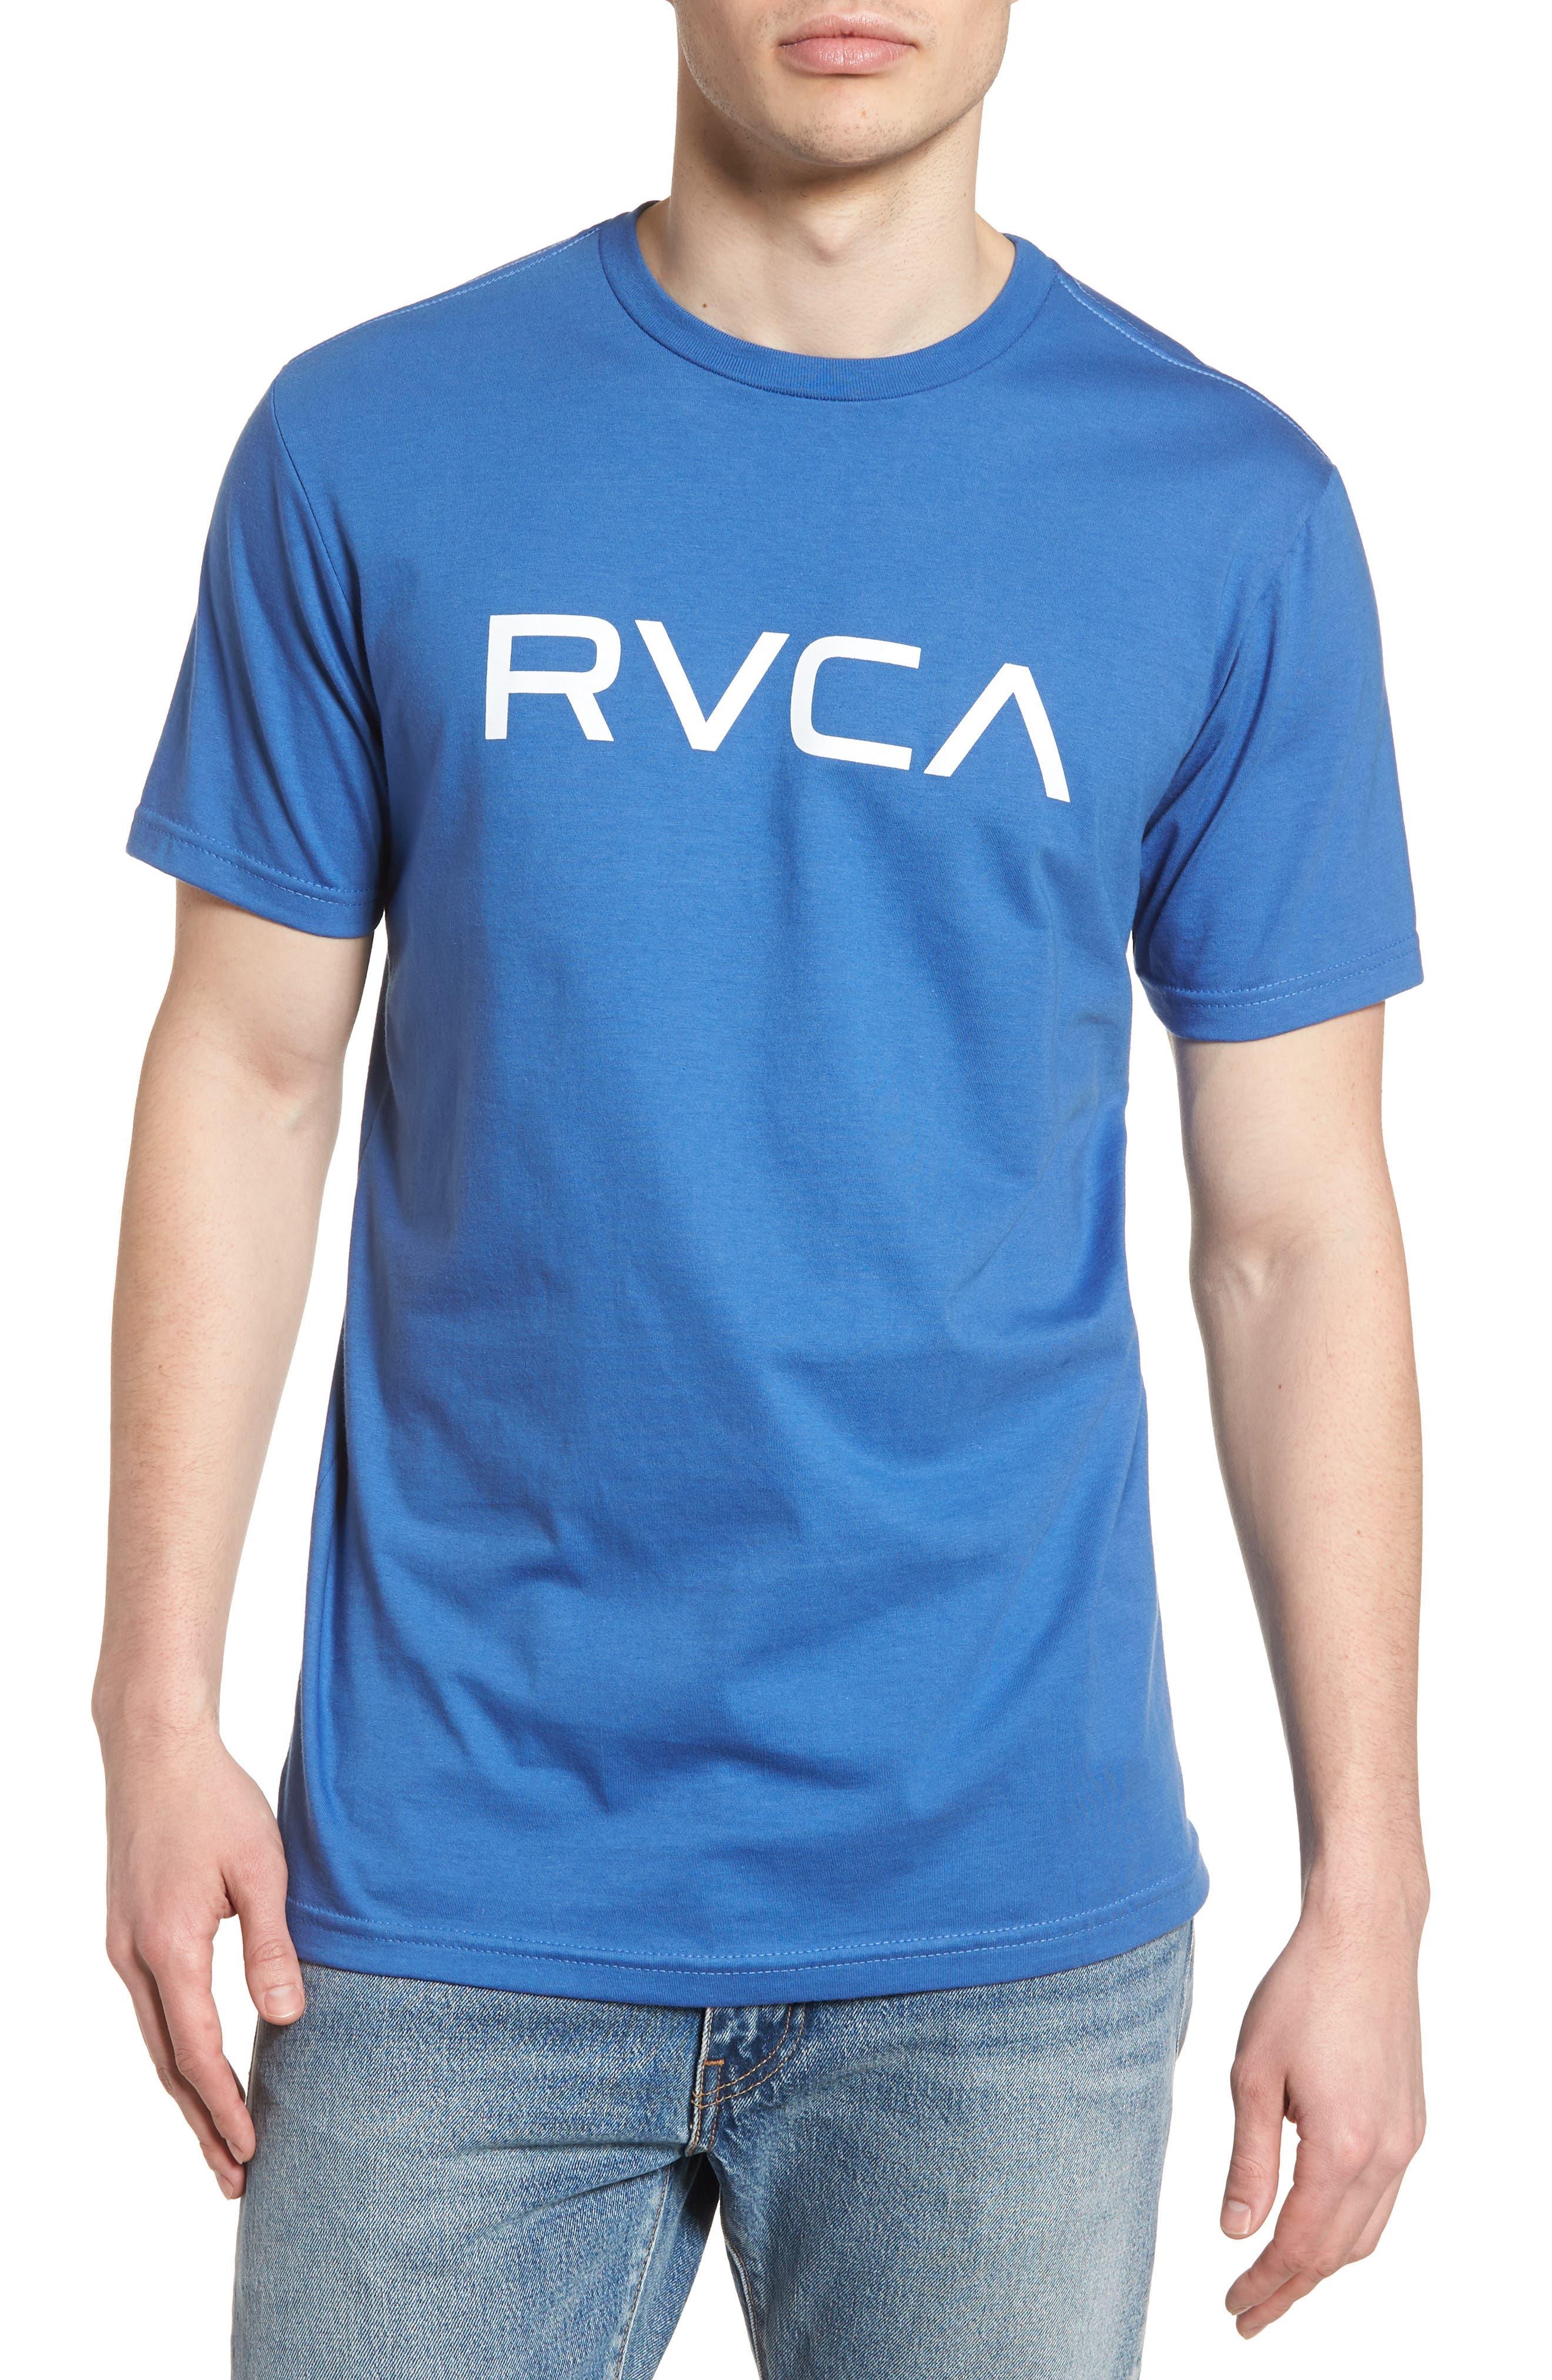 Alternate Image 1 Selected - RVCA Big RVCA Graphic T-Shirt